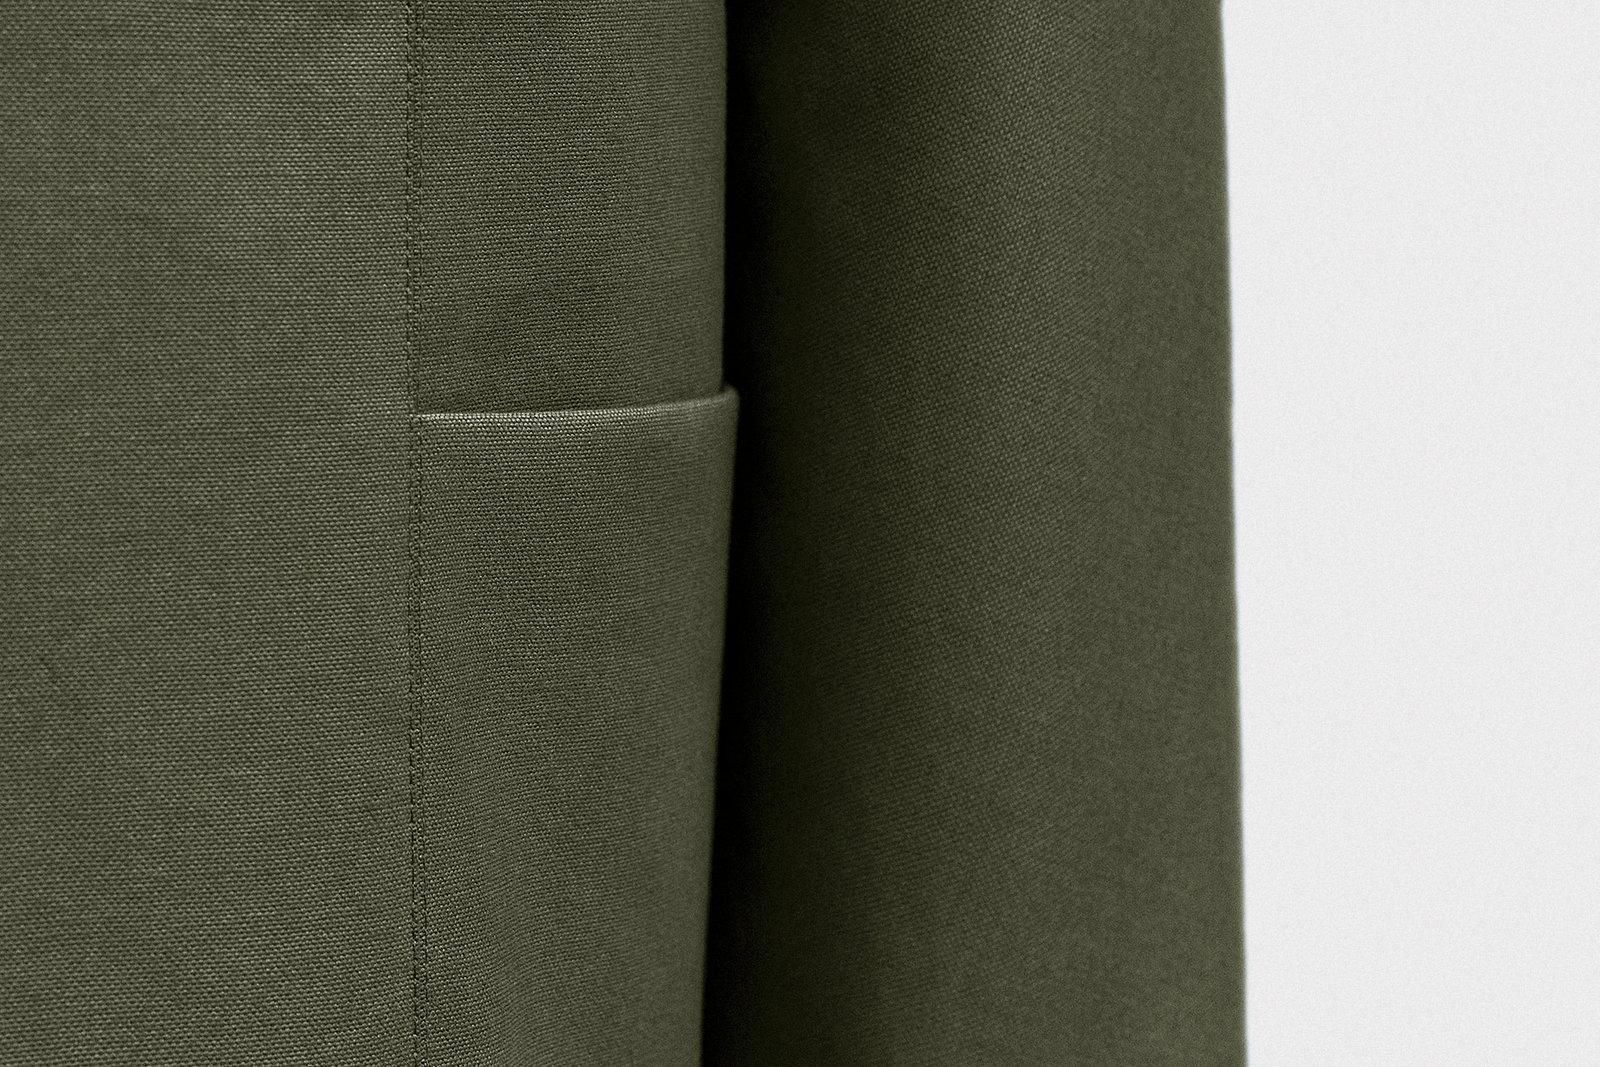 engineer-jacket-cotton-canvas-green-7@2x.jpg